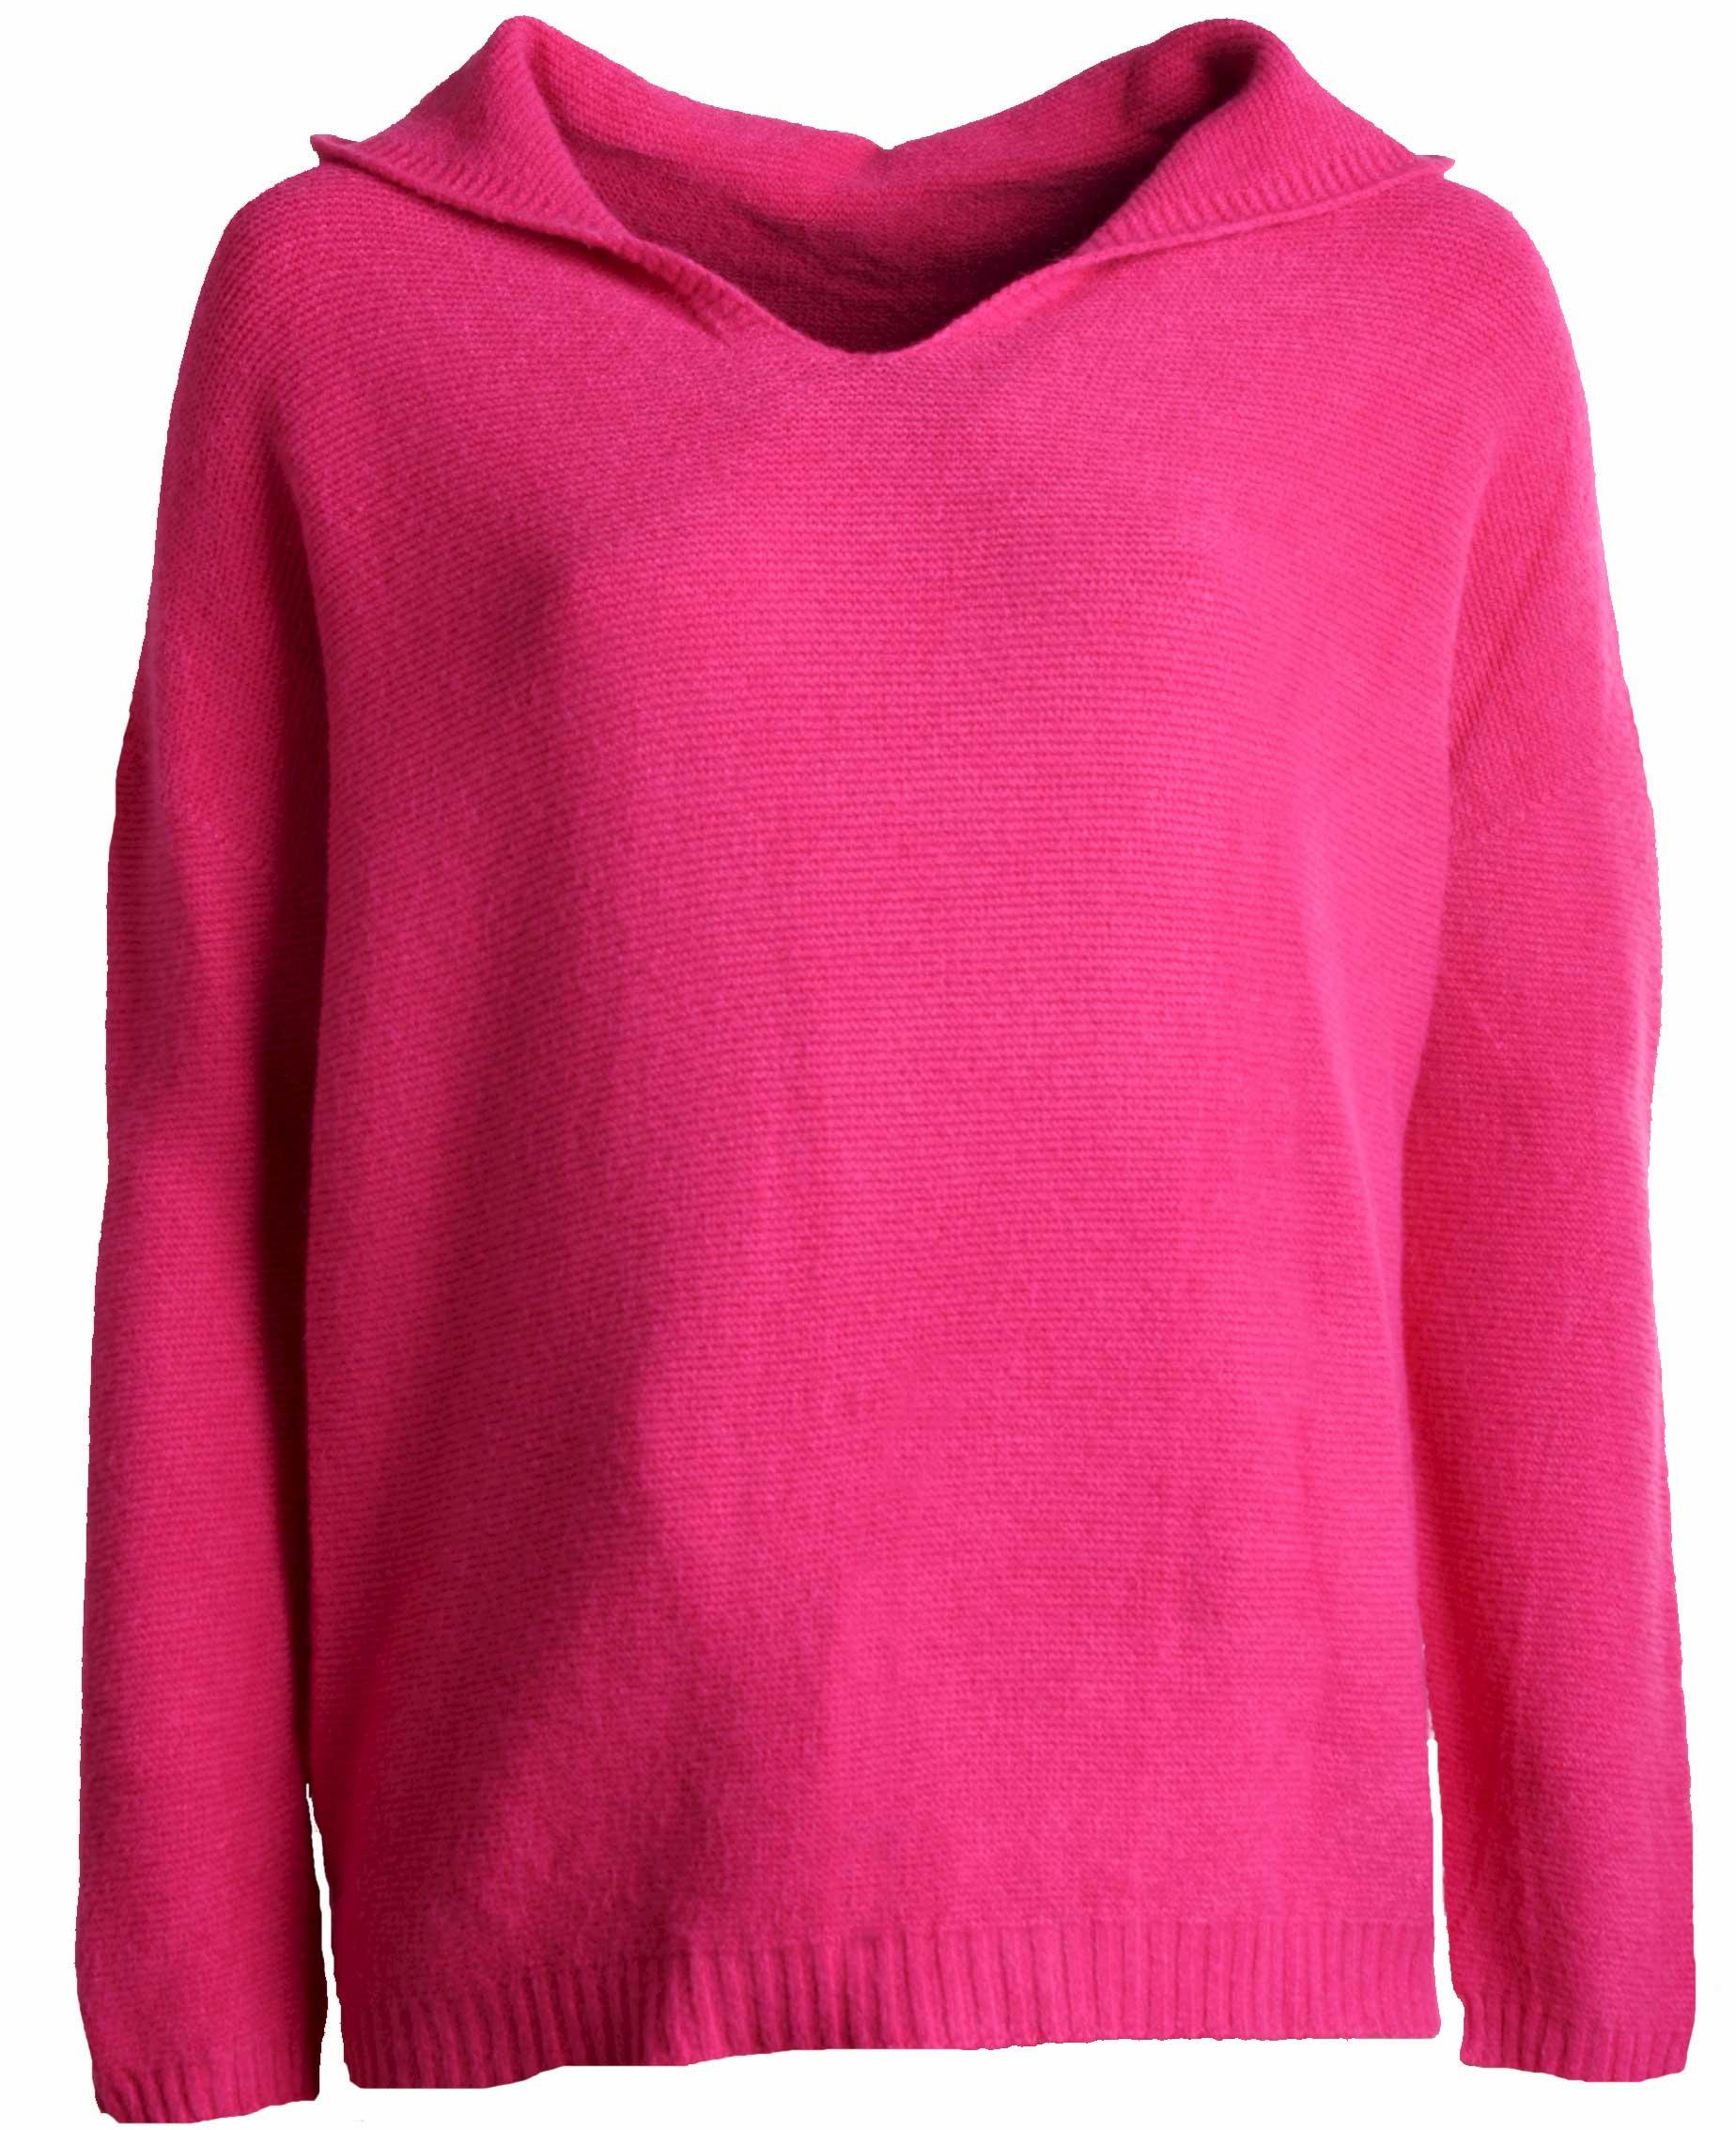 Pullover CAP pink